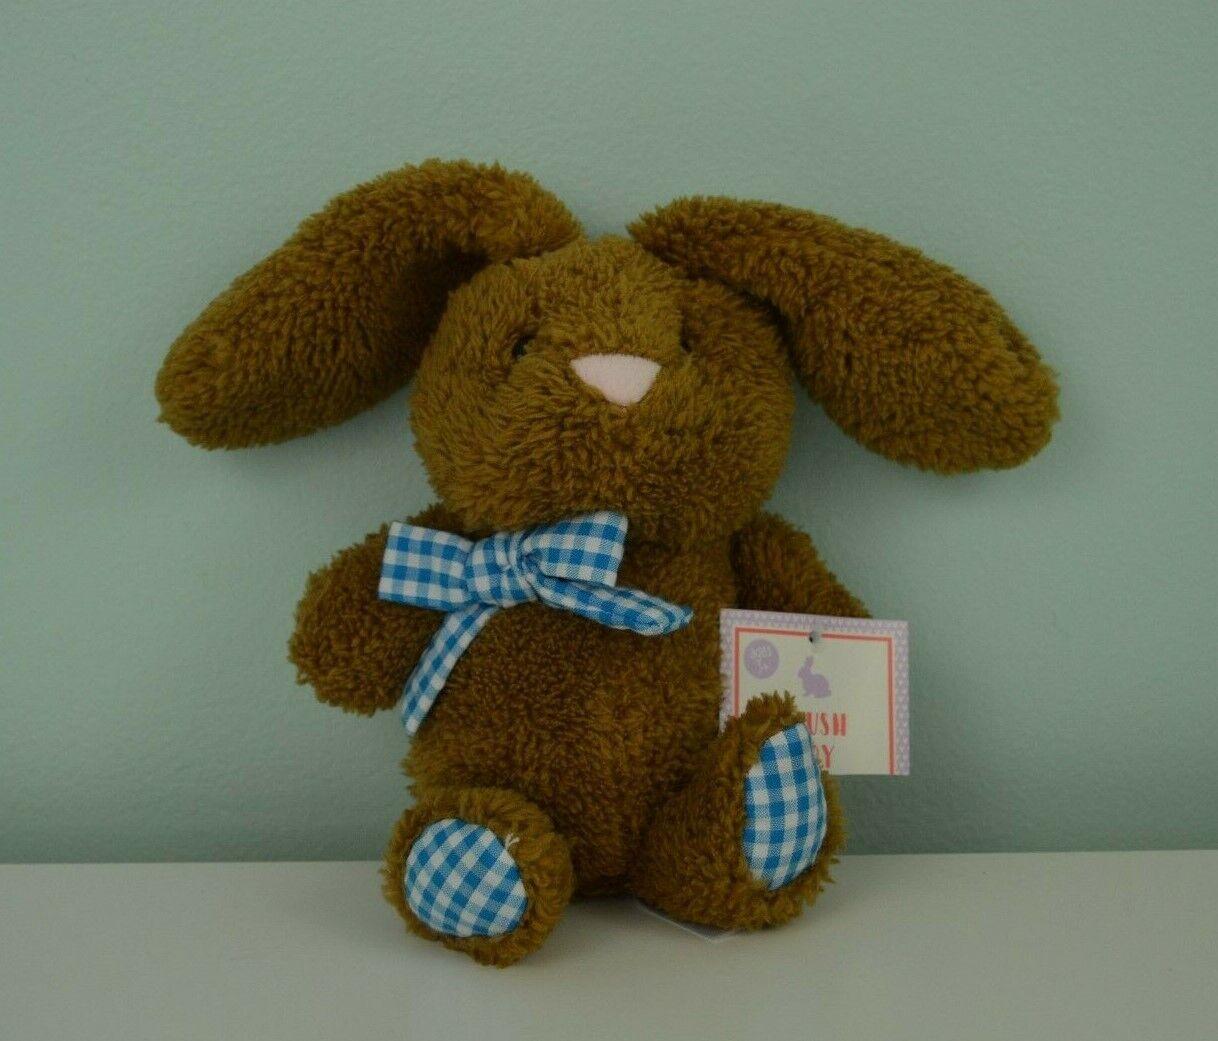 Animal Adventure Bunny Rabbit Plush Stuffed Toy Brown bluee White Gingham Bow